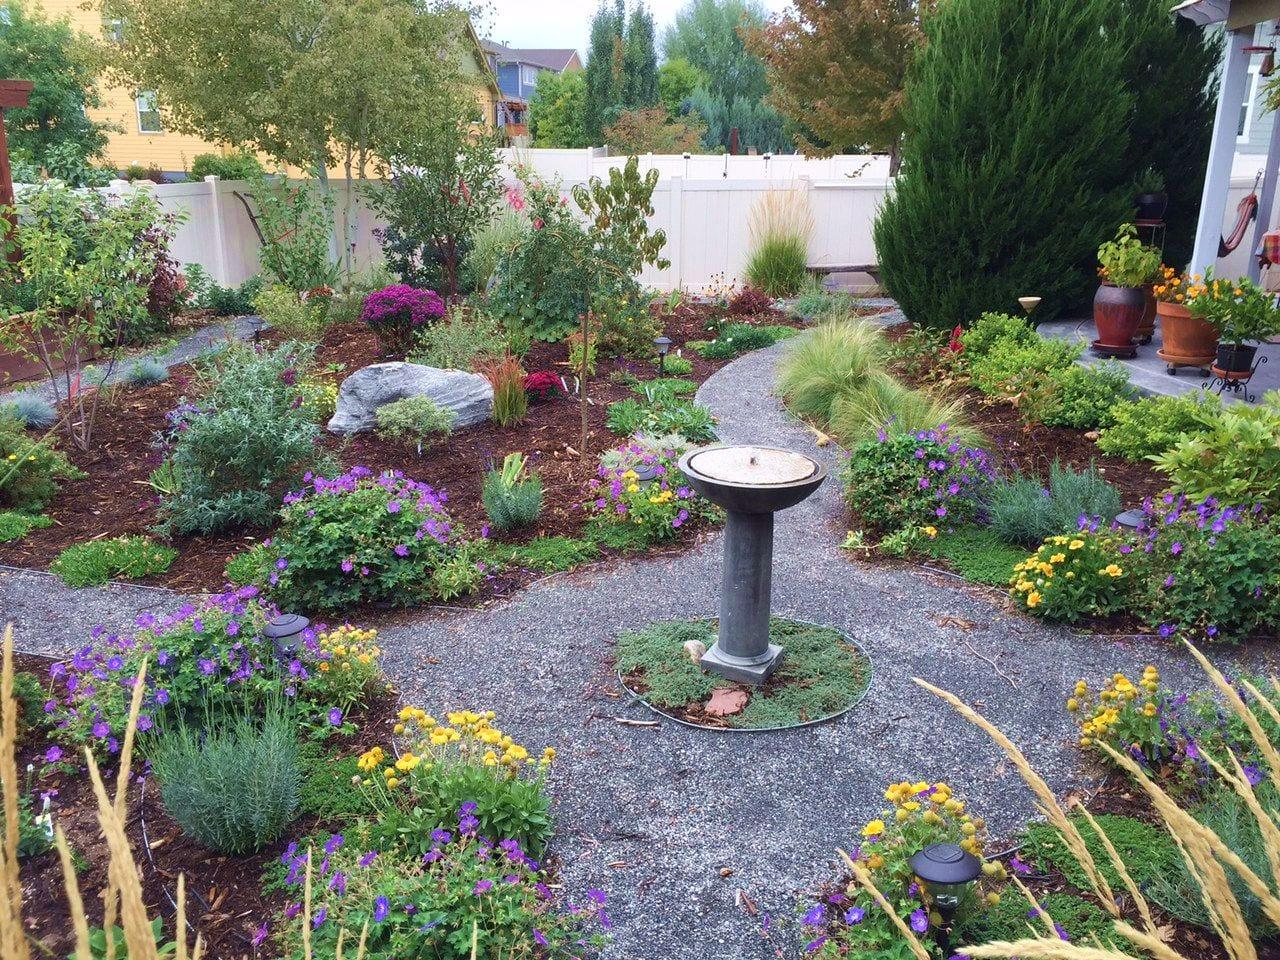 pollinator friendly pathway